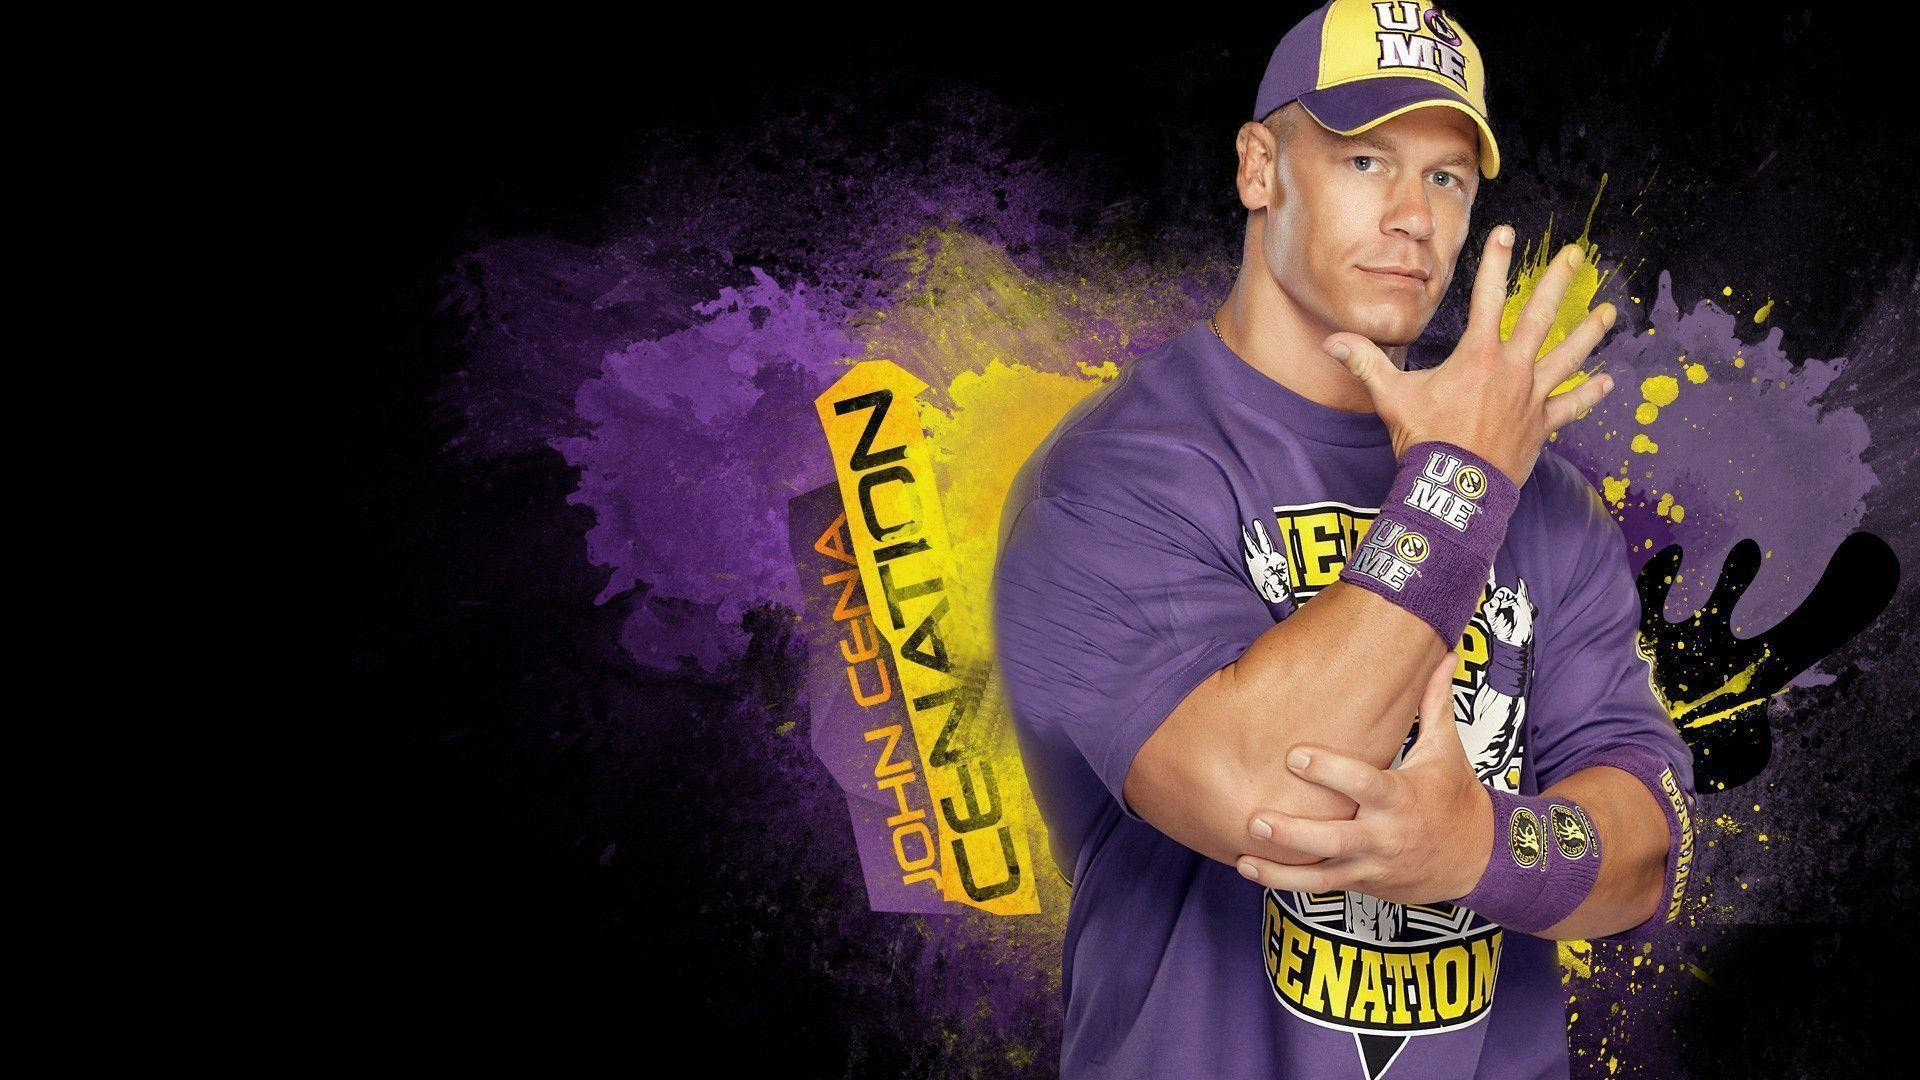 John Cena Wallpaper Rise Above Hate (63+ images)  John Cena Wallp...